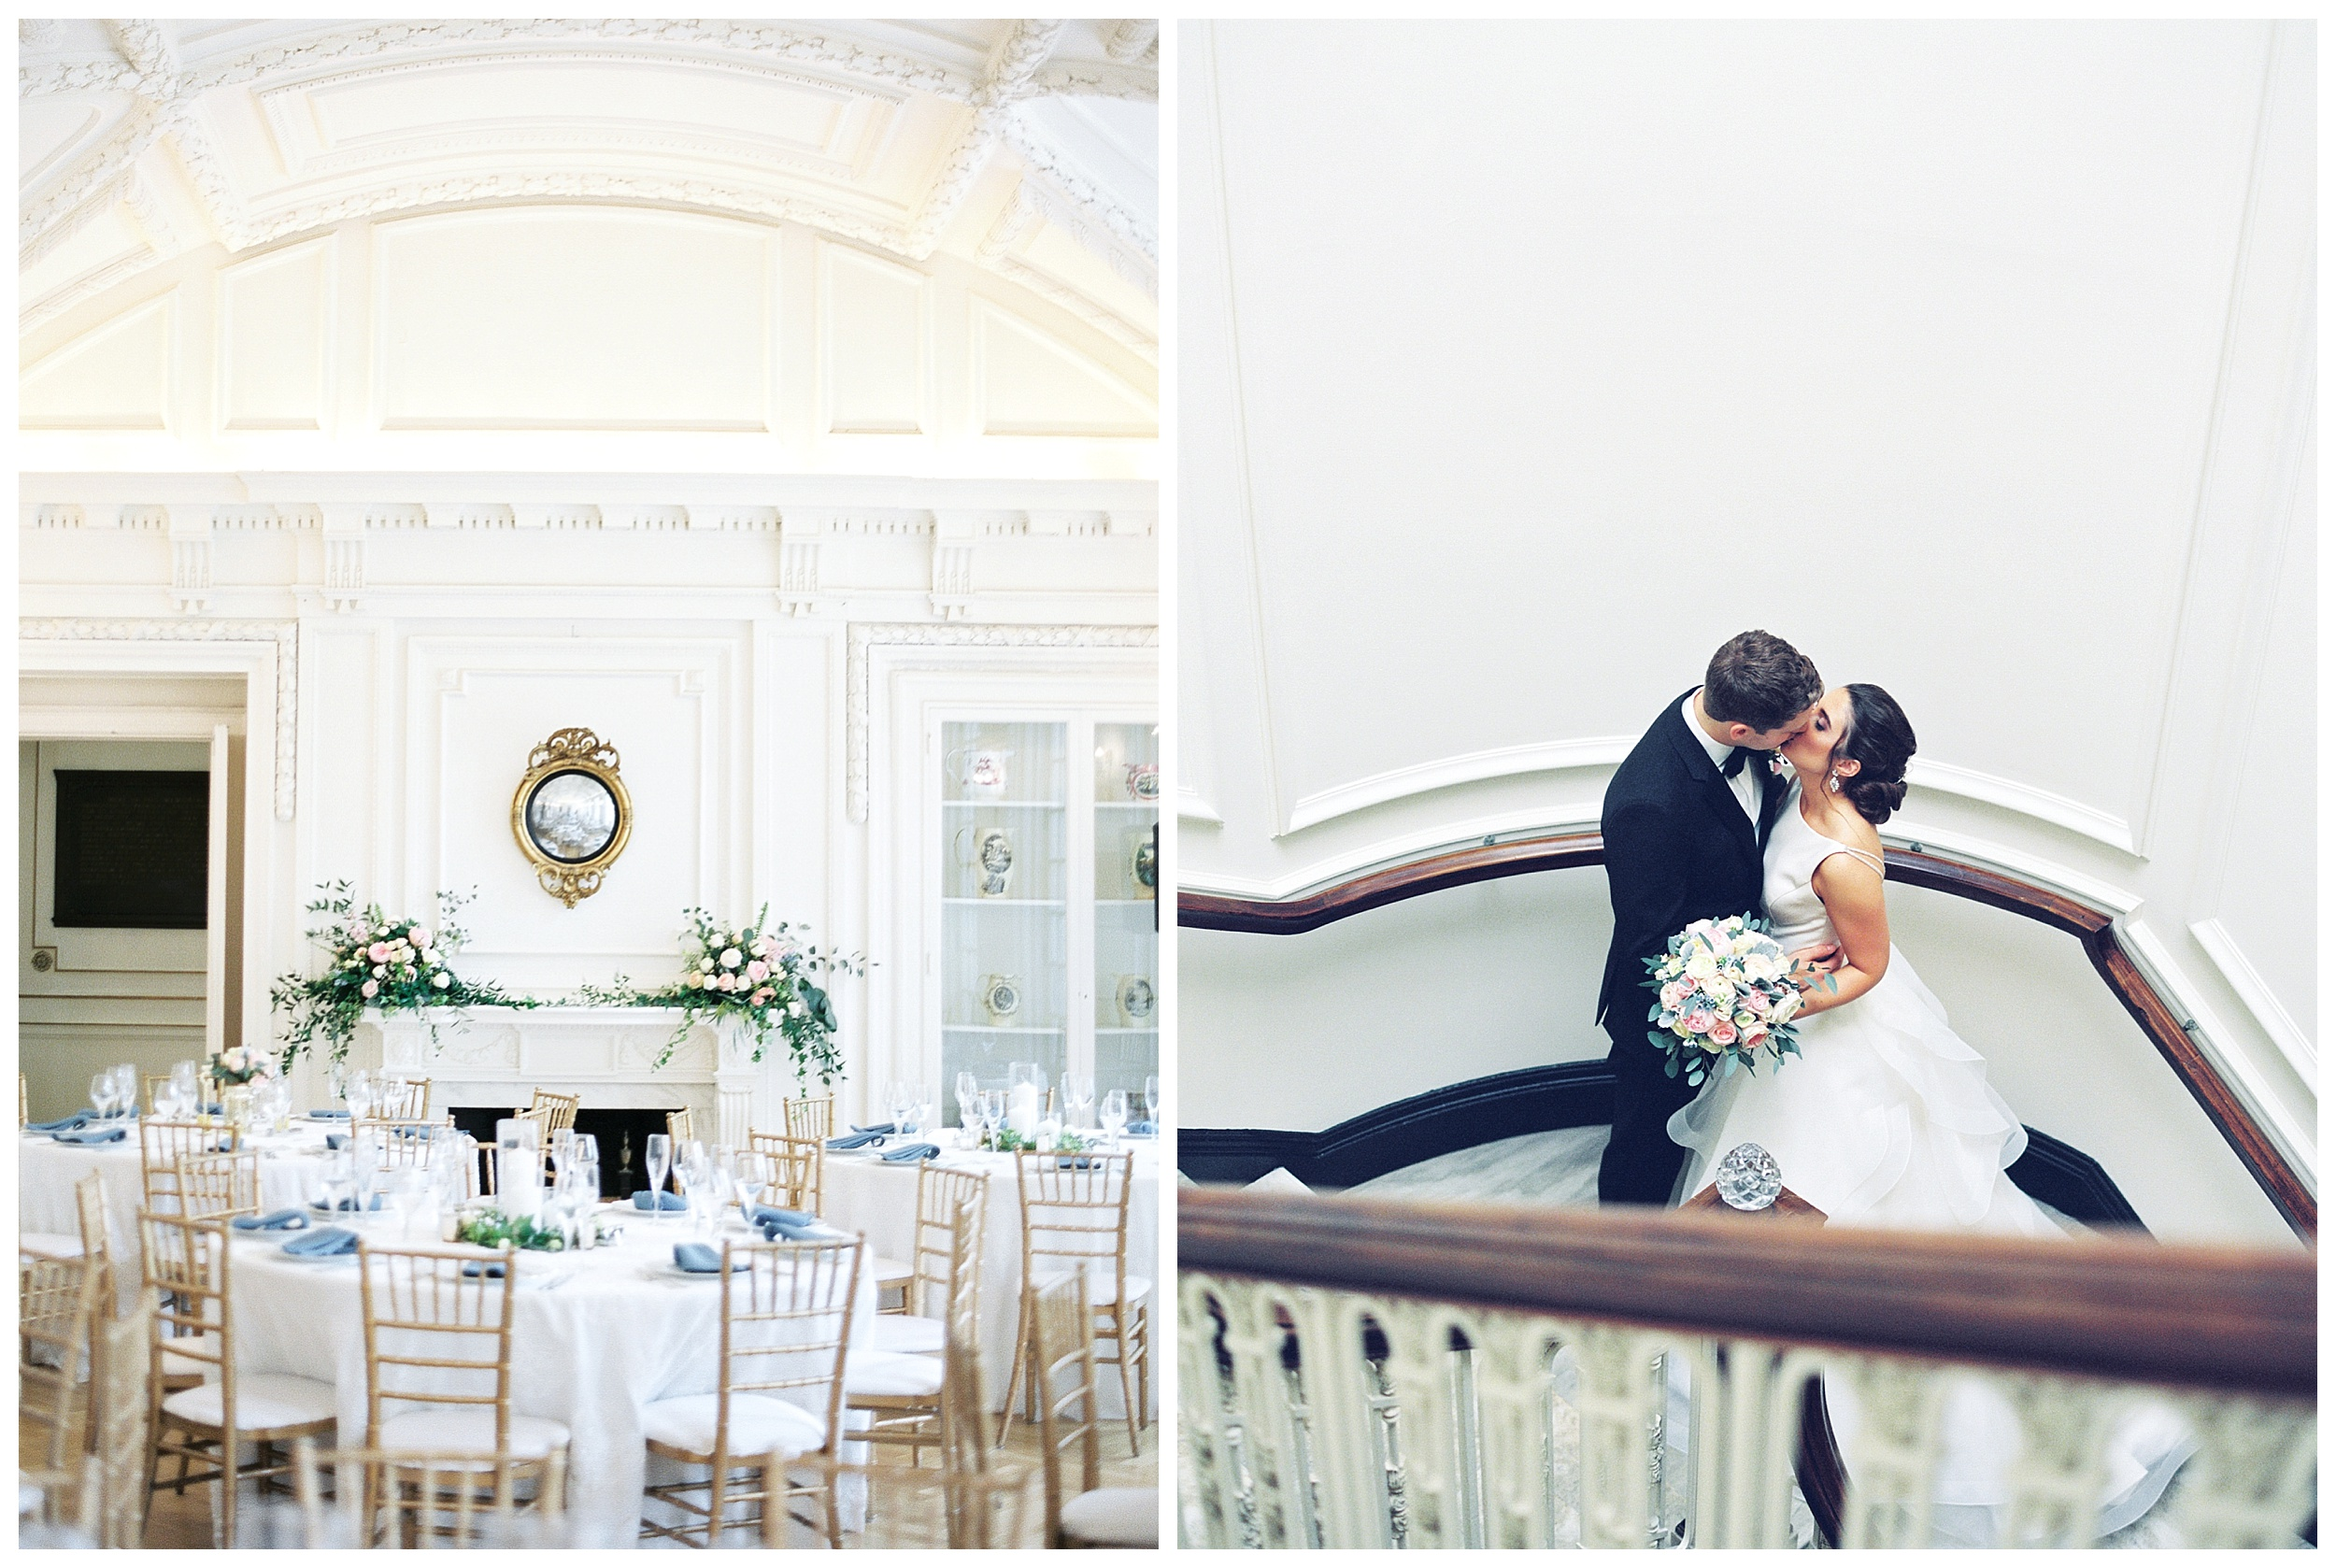 DAR Constitution Hall Wedding Wedding | Daughters of the American Revolution Wedding | District of Columbia Film Wedding Photographer Kir Tuben_0125.jpg